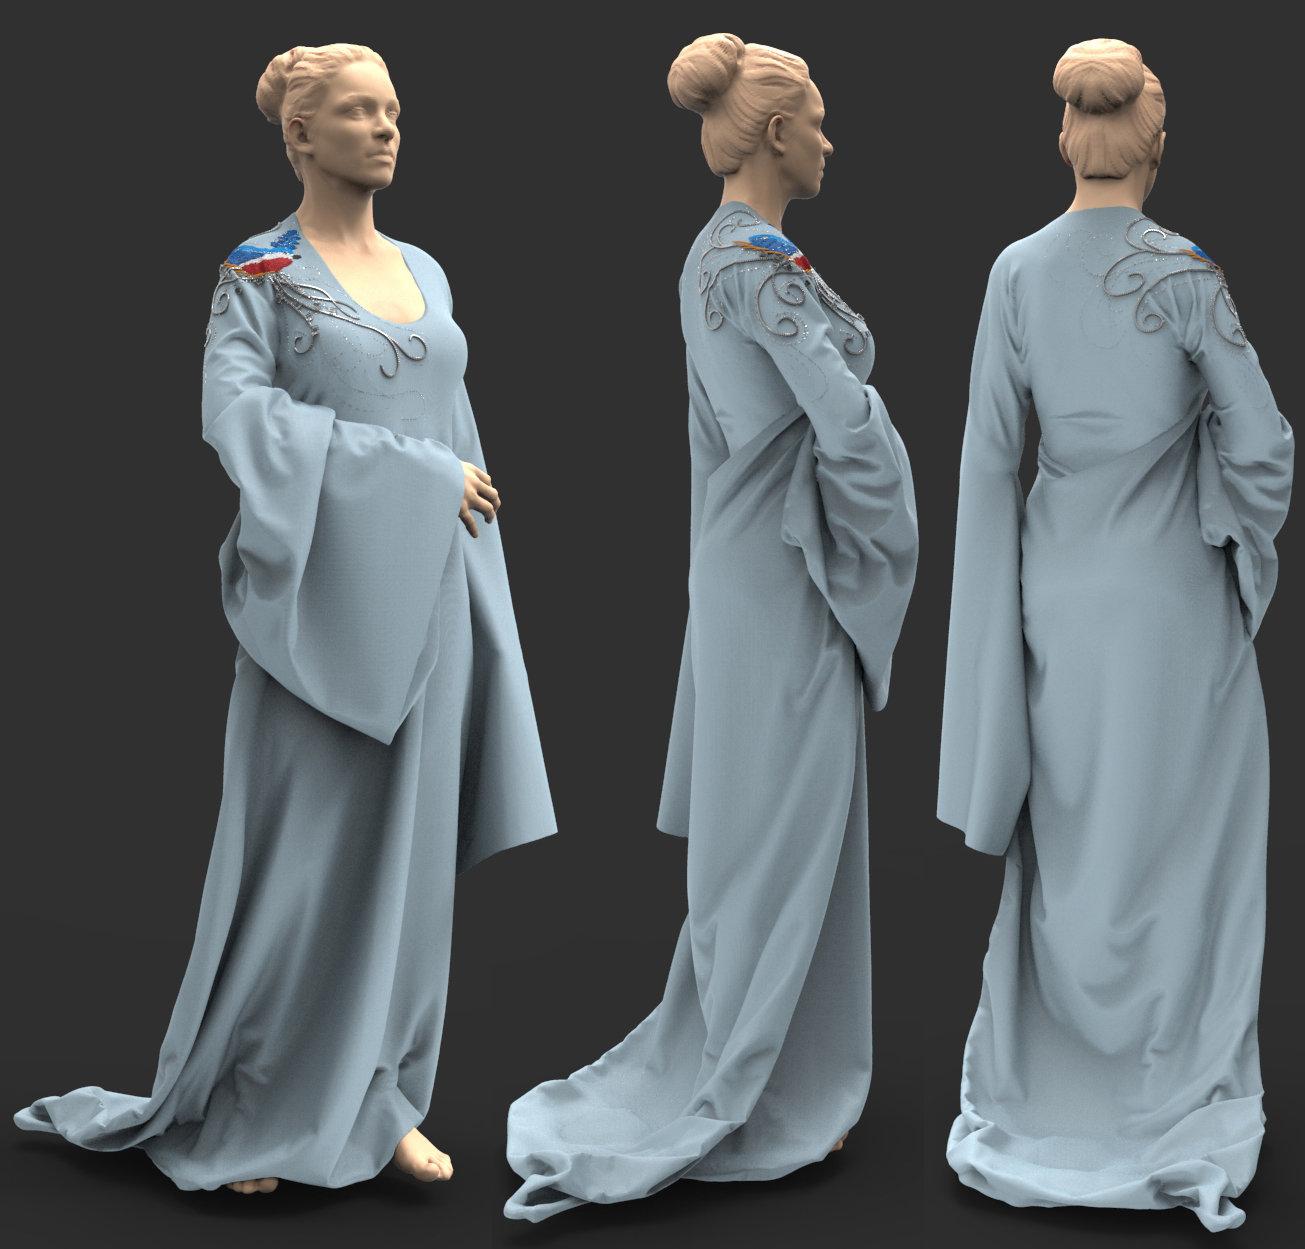 Marvelous Designer cloth with zbrush nanomesh stitching